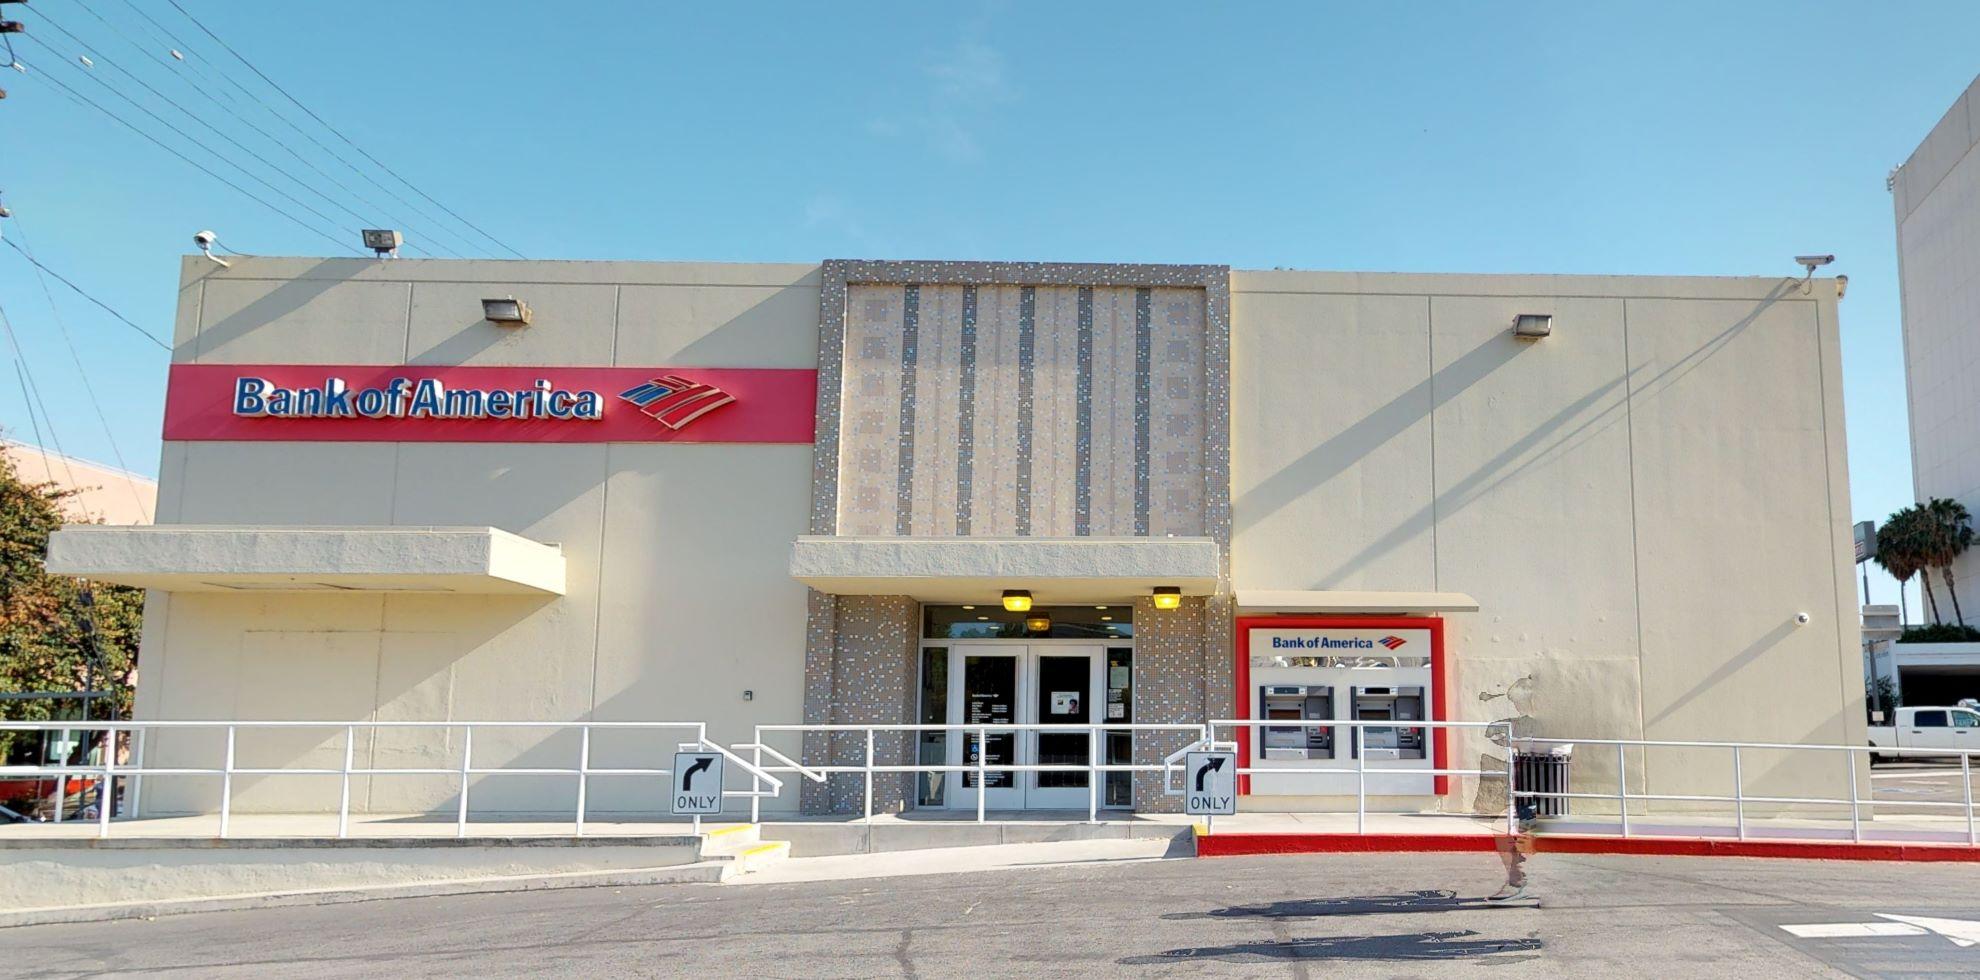 Bank of America financial center with drive-thru ATM   14701 Ventura Blvd, Sherman Oaks, CA 91403